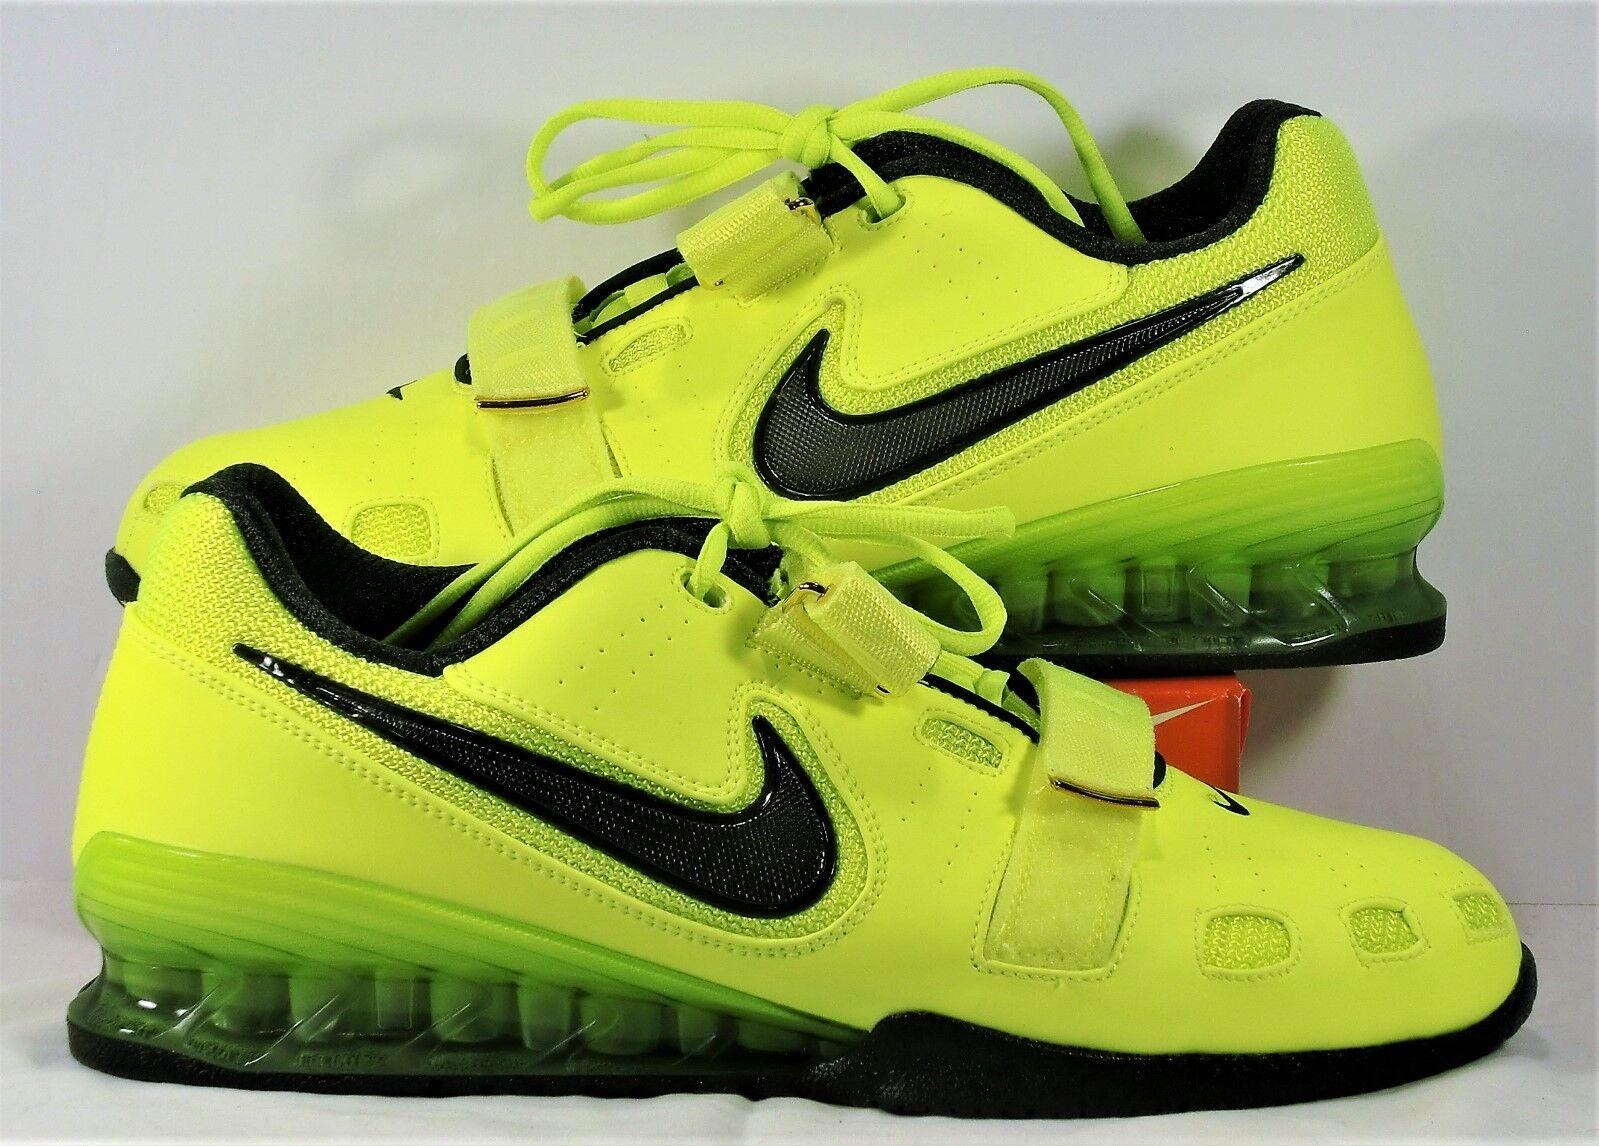 Nike Romaleos 2 Black & Volt Training Weightlifting Shoes Sz 15 NEW 476927 700